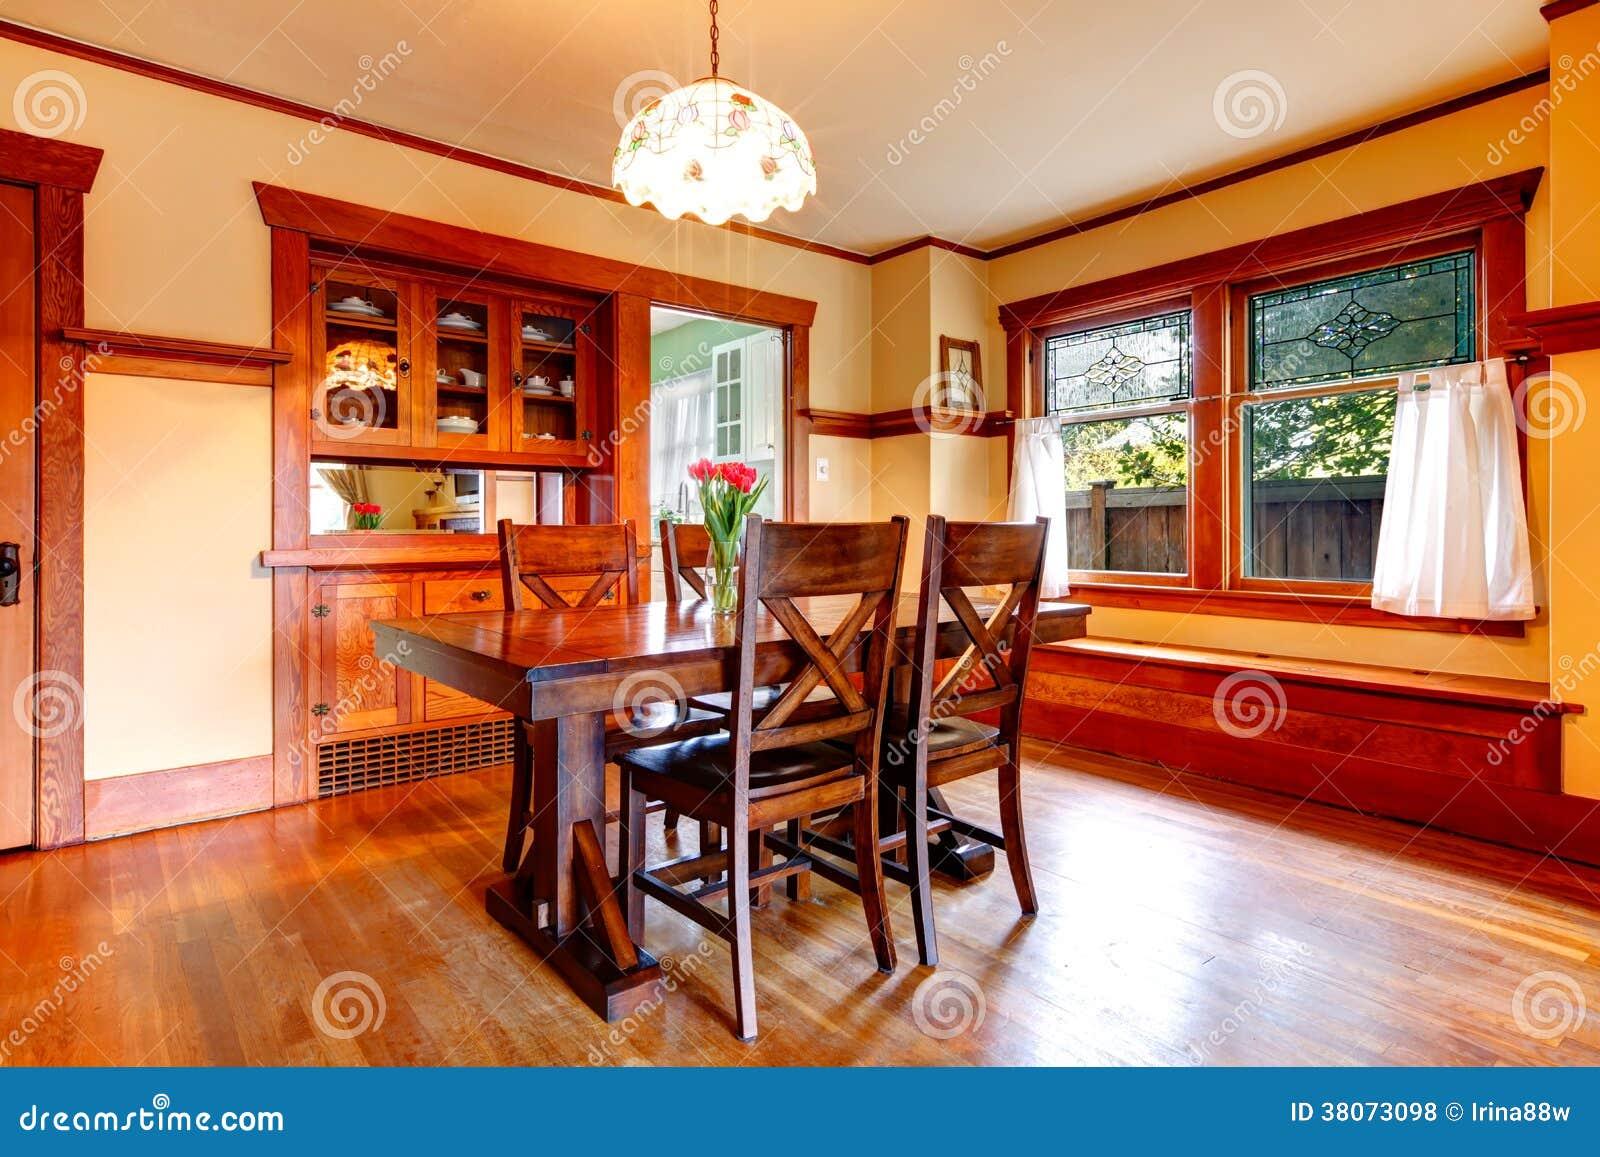 Sala da pranzo rustica fotografia stock. Immagine di libero - 38073098